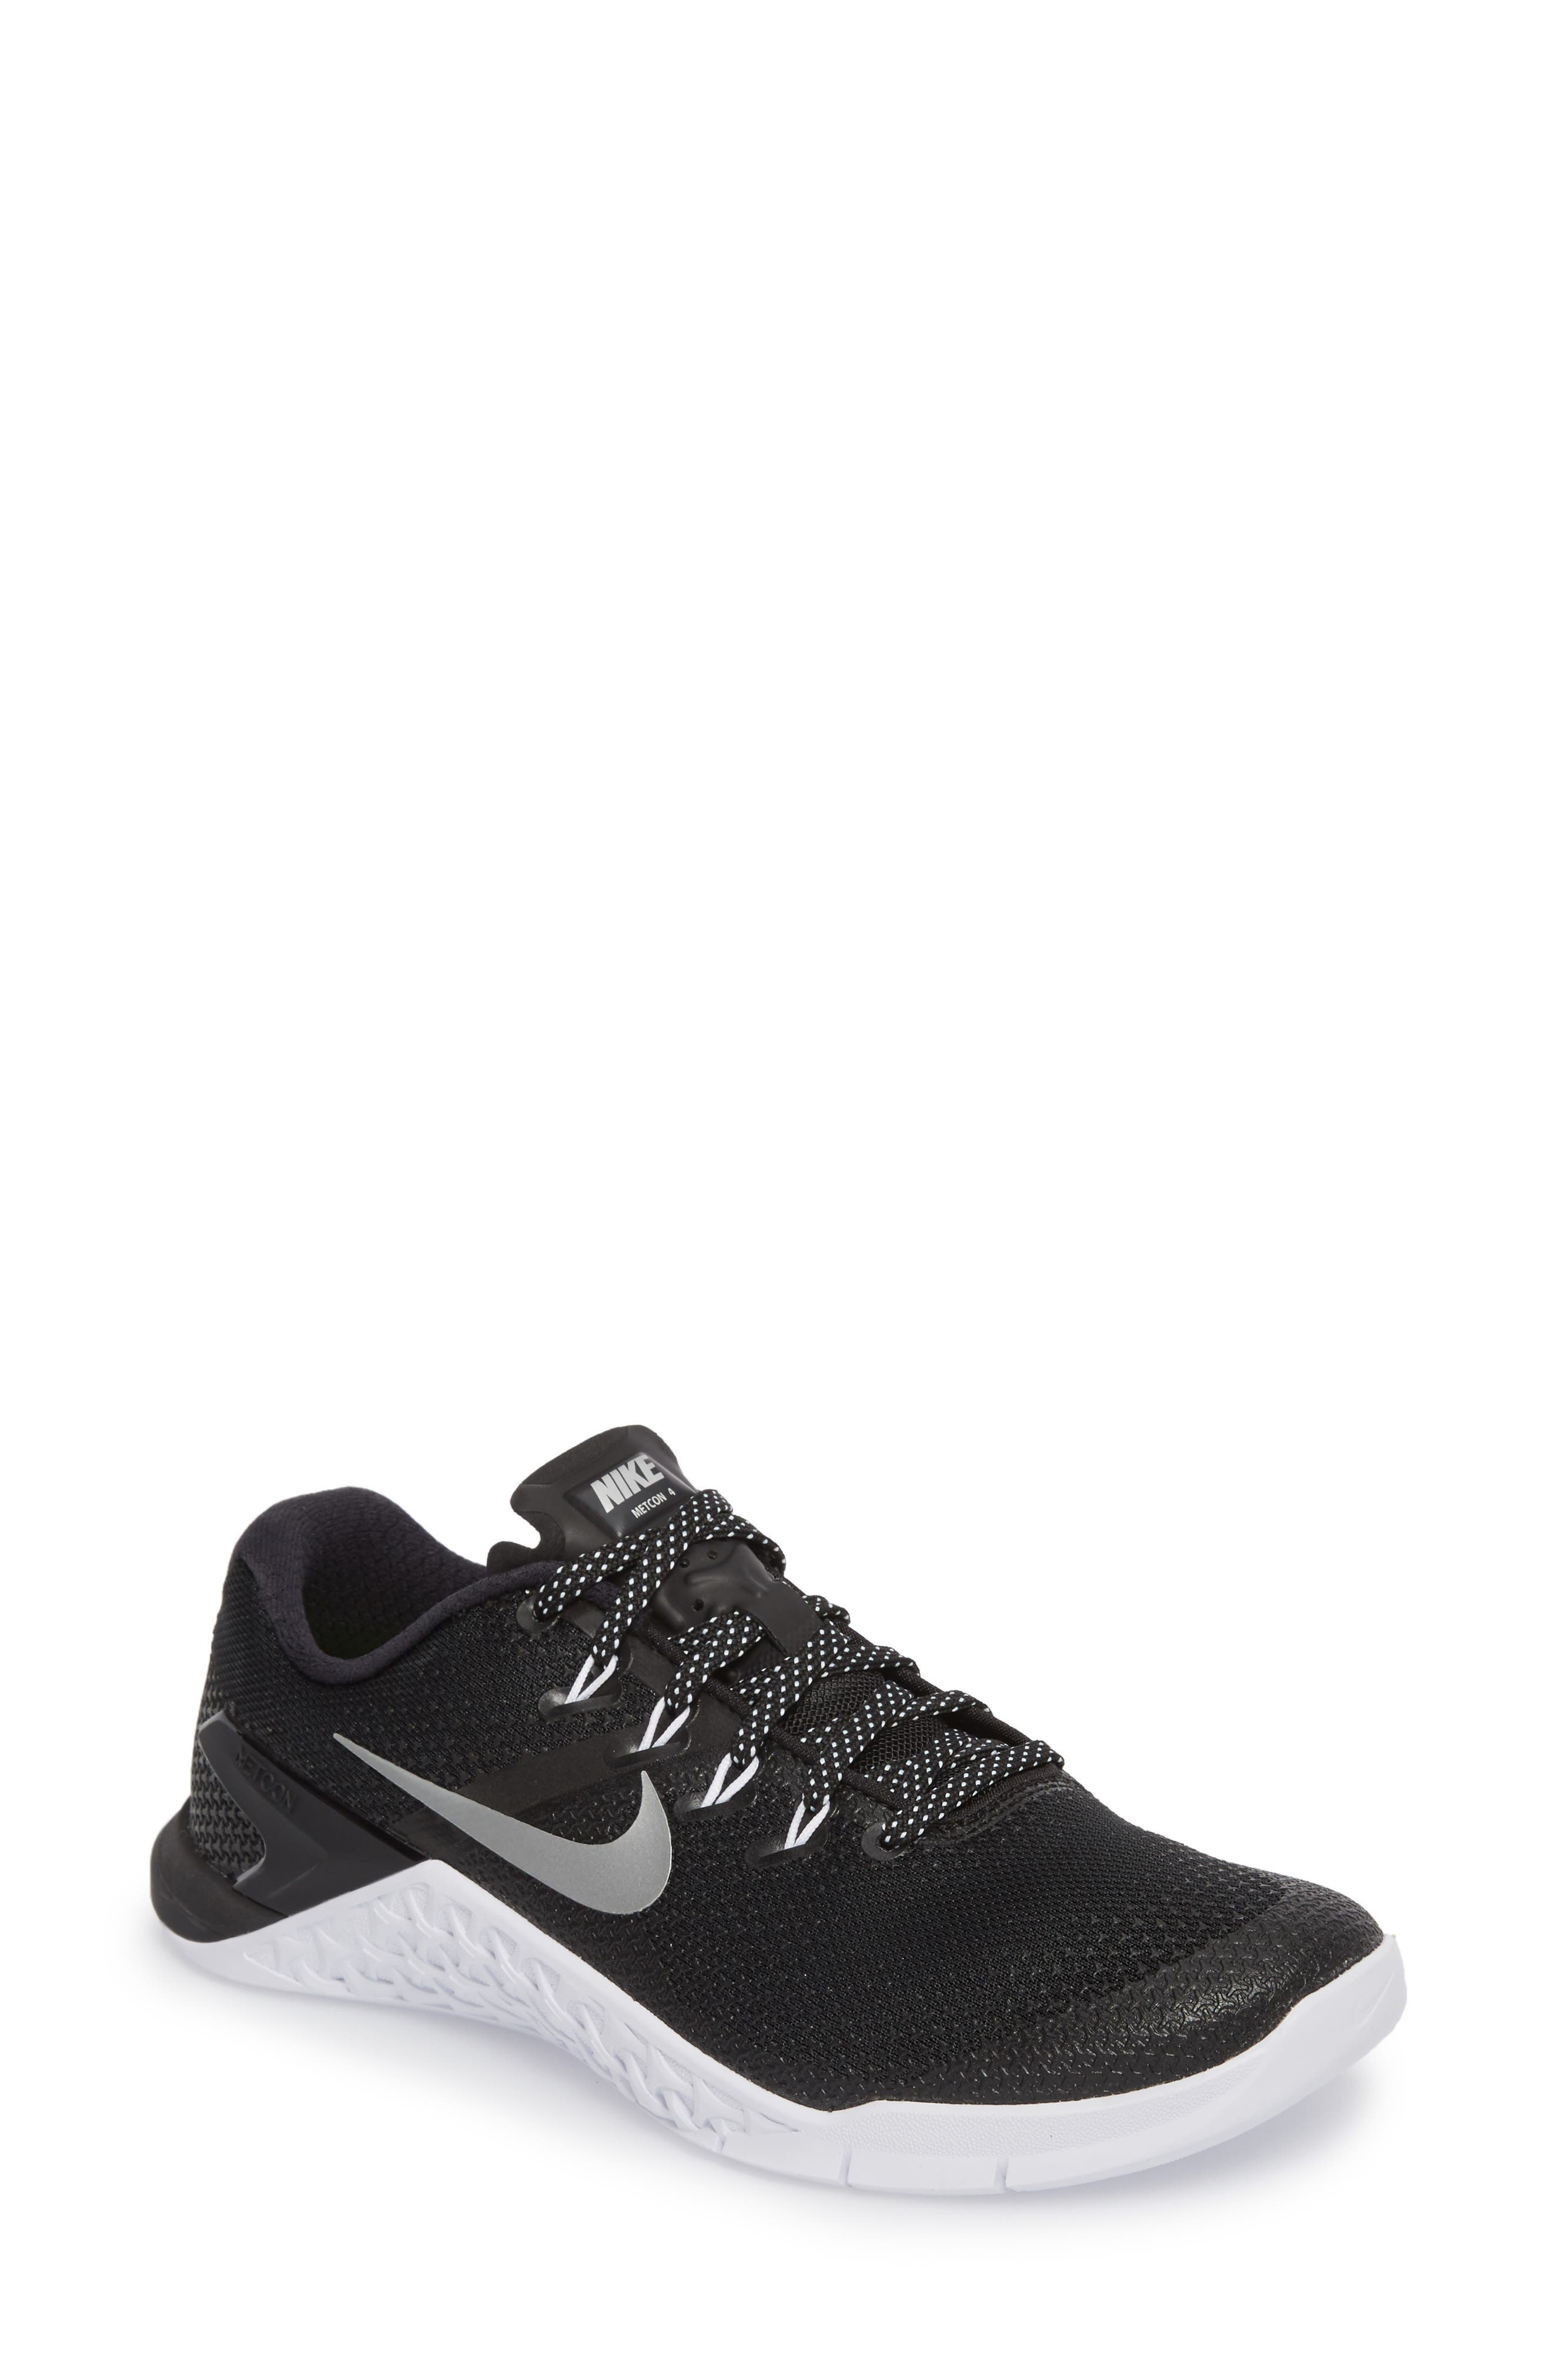 Metcon 4 Training Shoe,                         Main,                         color,